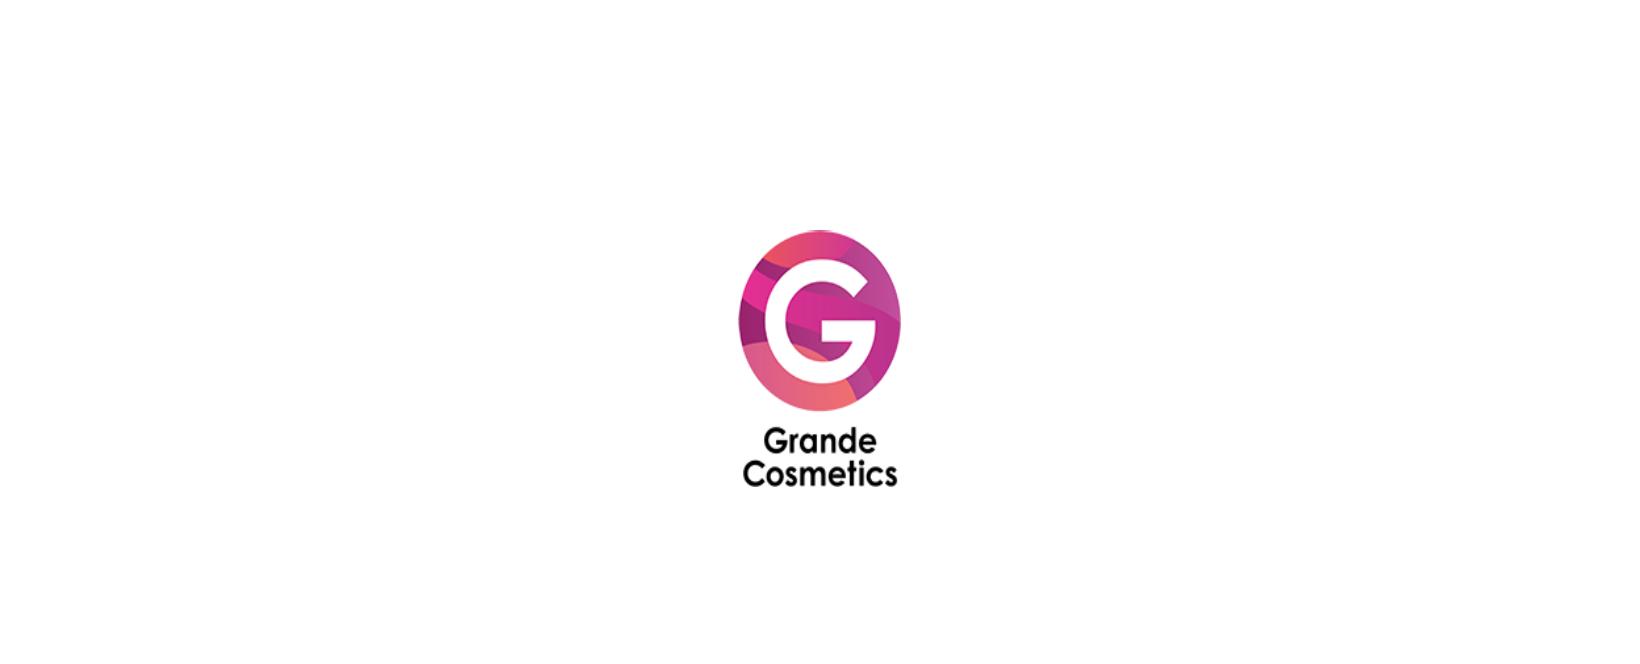 Grande Cosmetics Coupon Code 2021